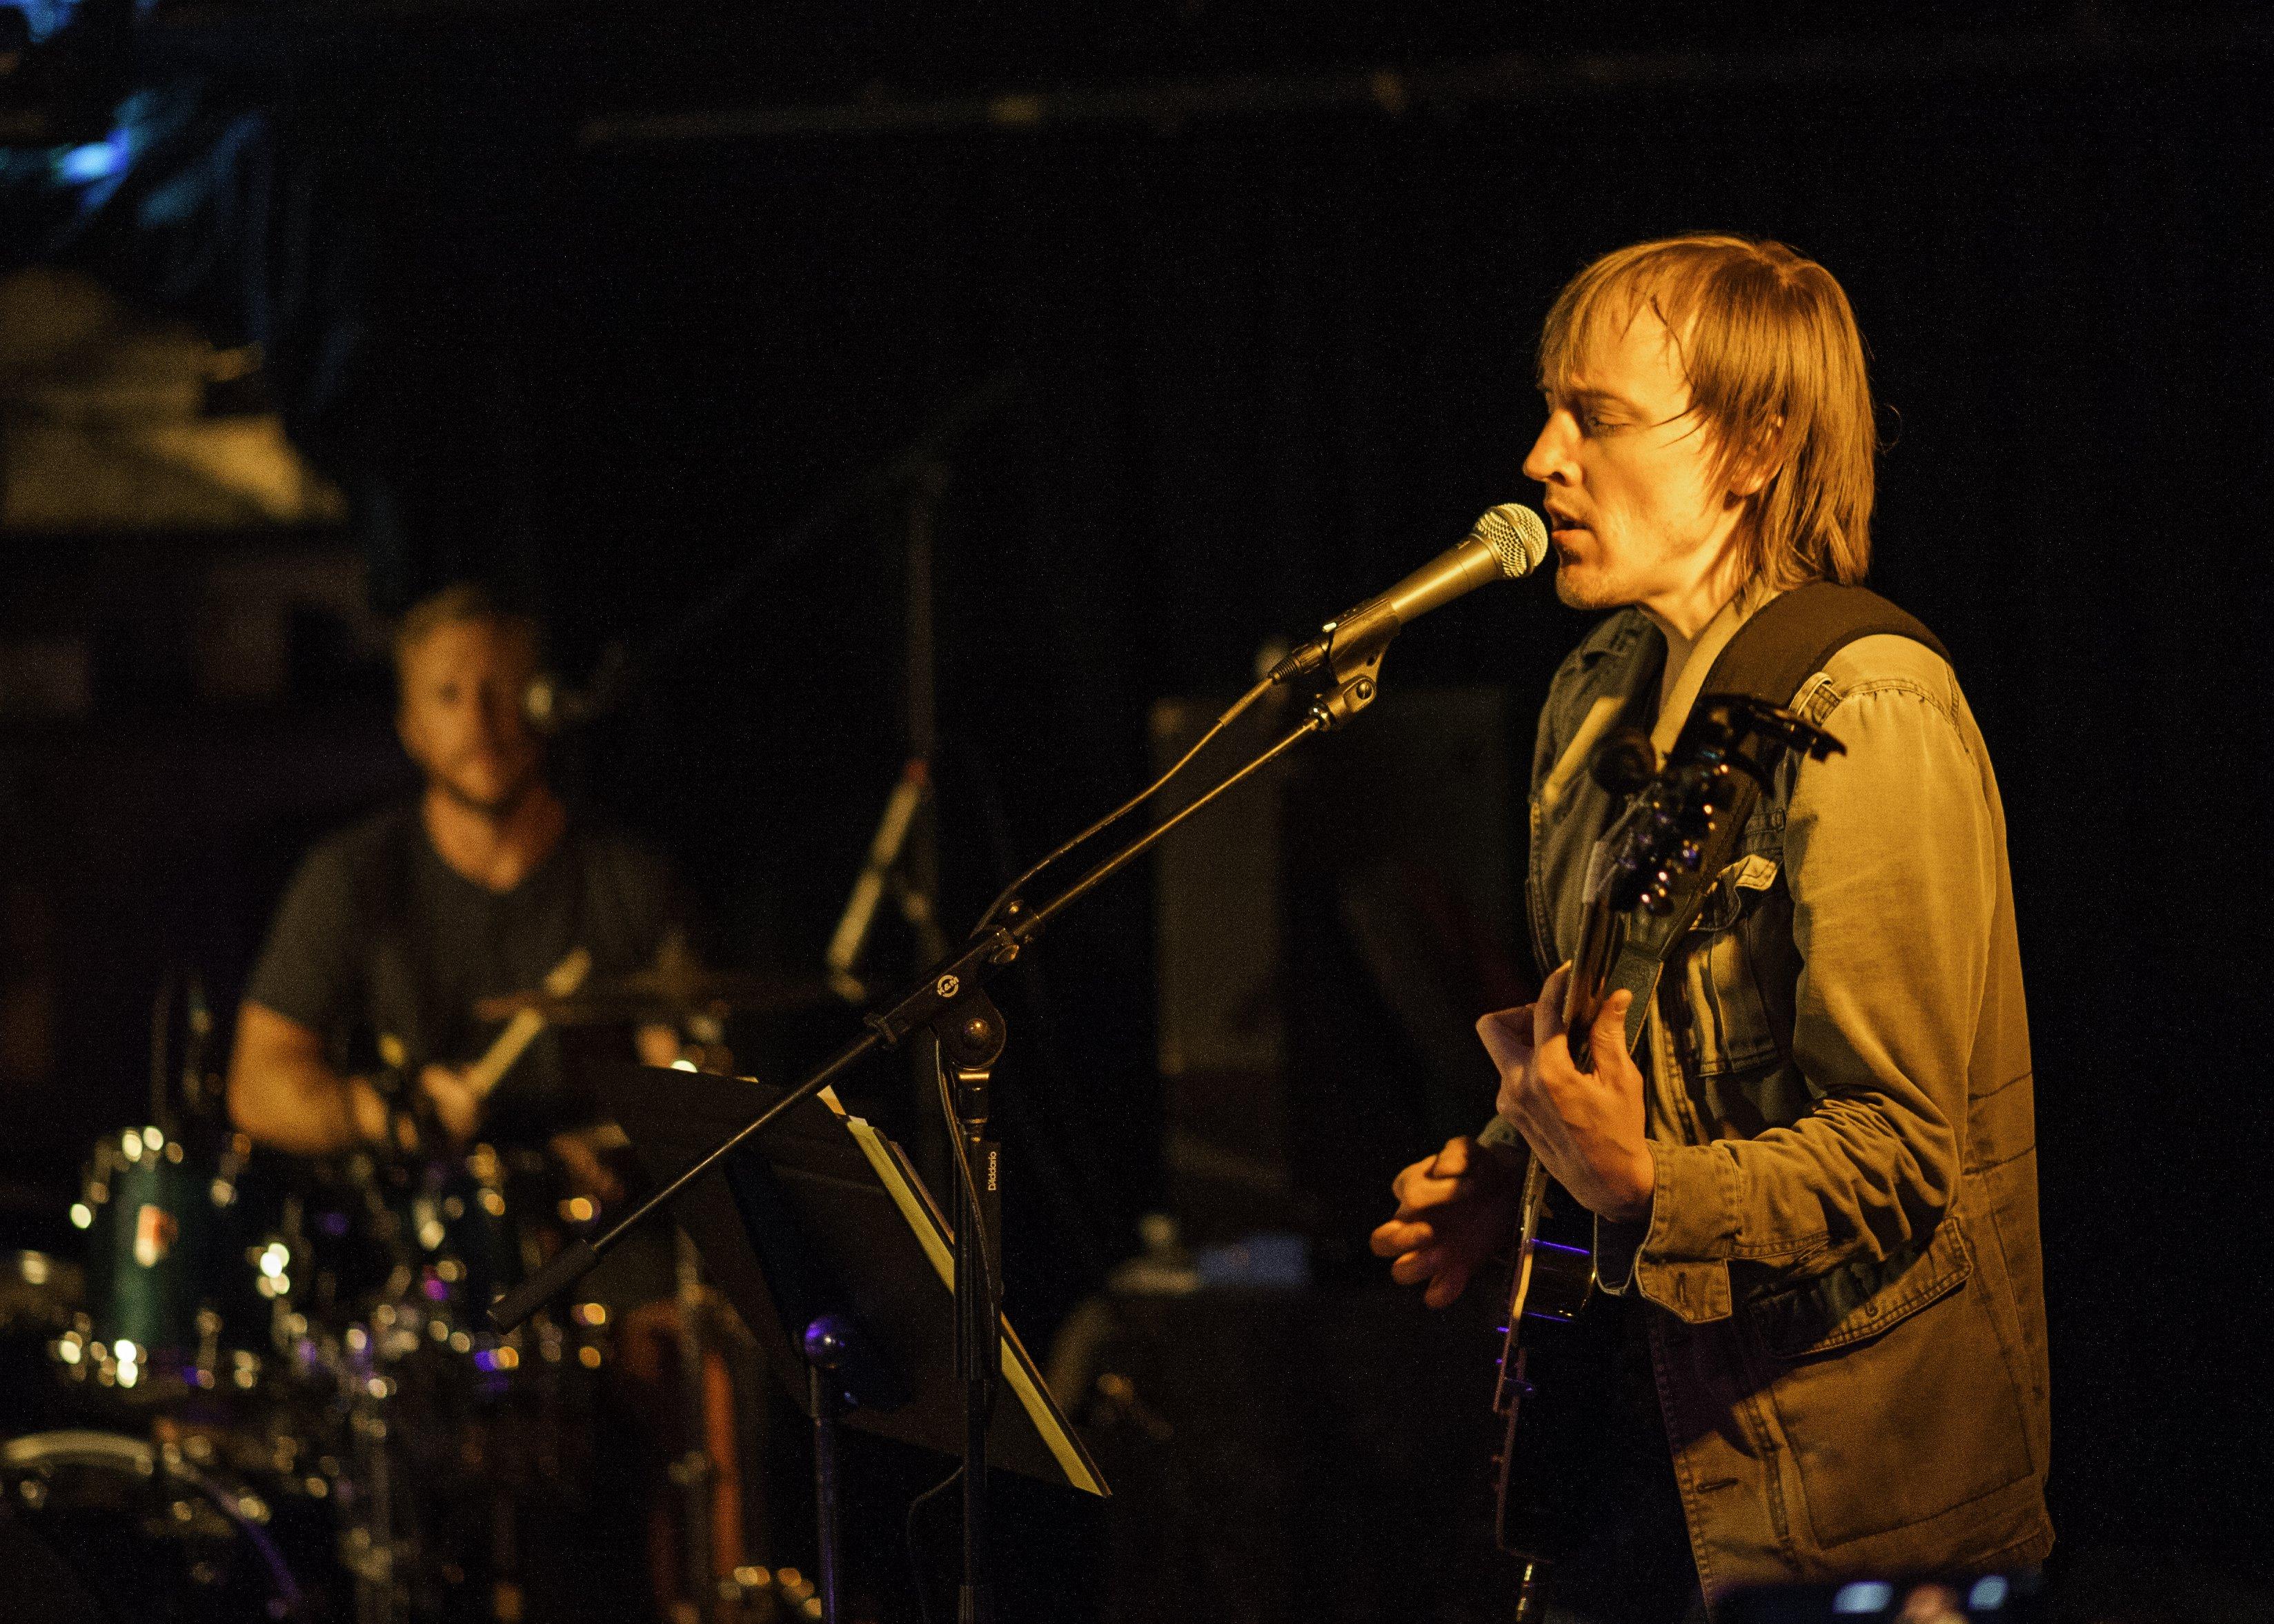 Echodrive's Andrew Hand and Jake Boggess - Zebra, Bozeman, MT